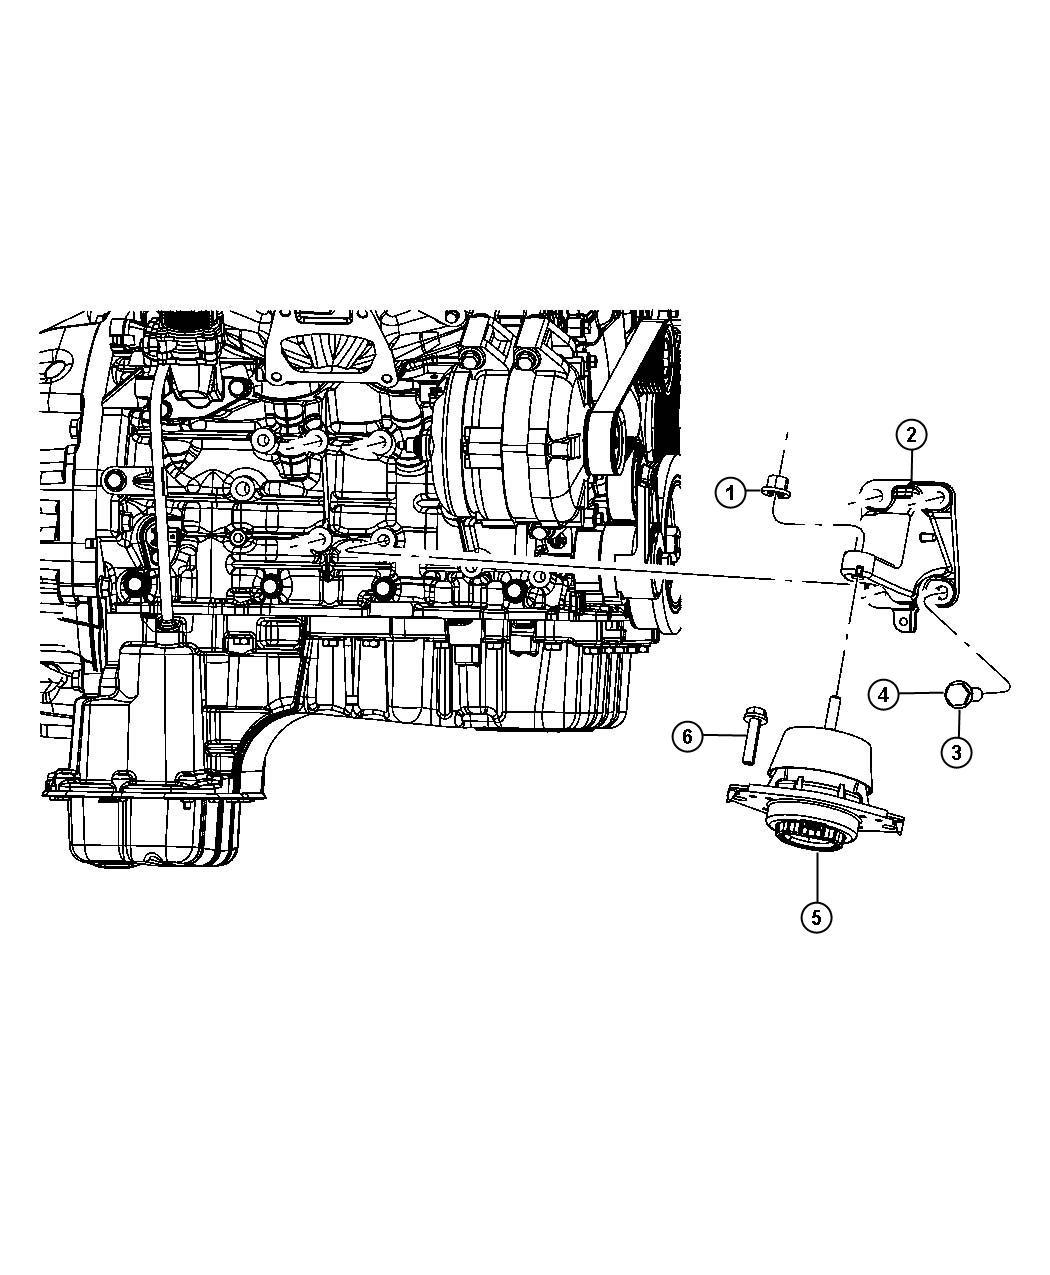 Dodge Durango Isolator. Engine mount. Left side, right